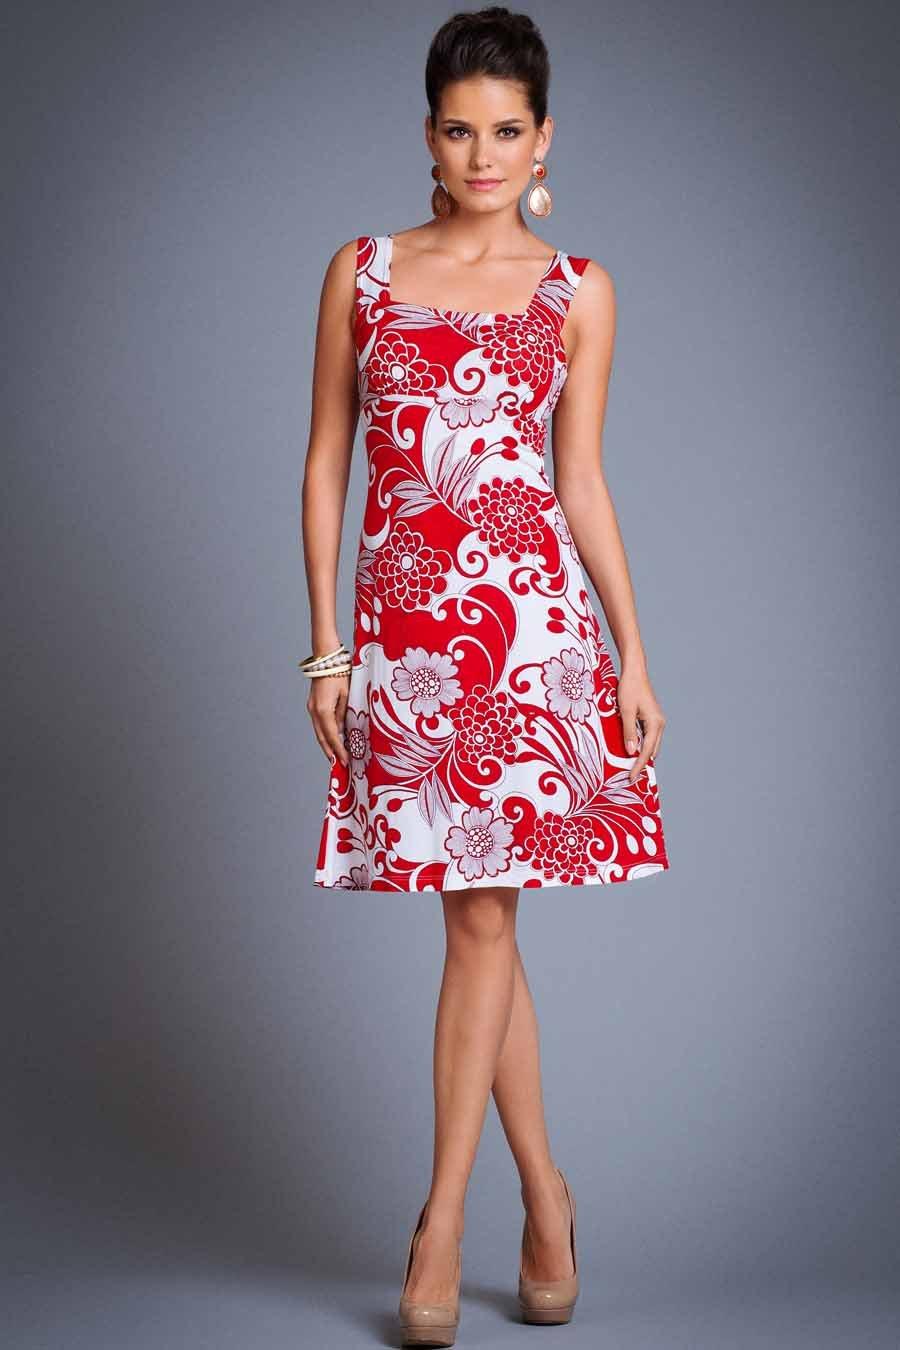 Юбка Emka Fashion - купить юбки Emka Fashion в интернет